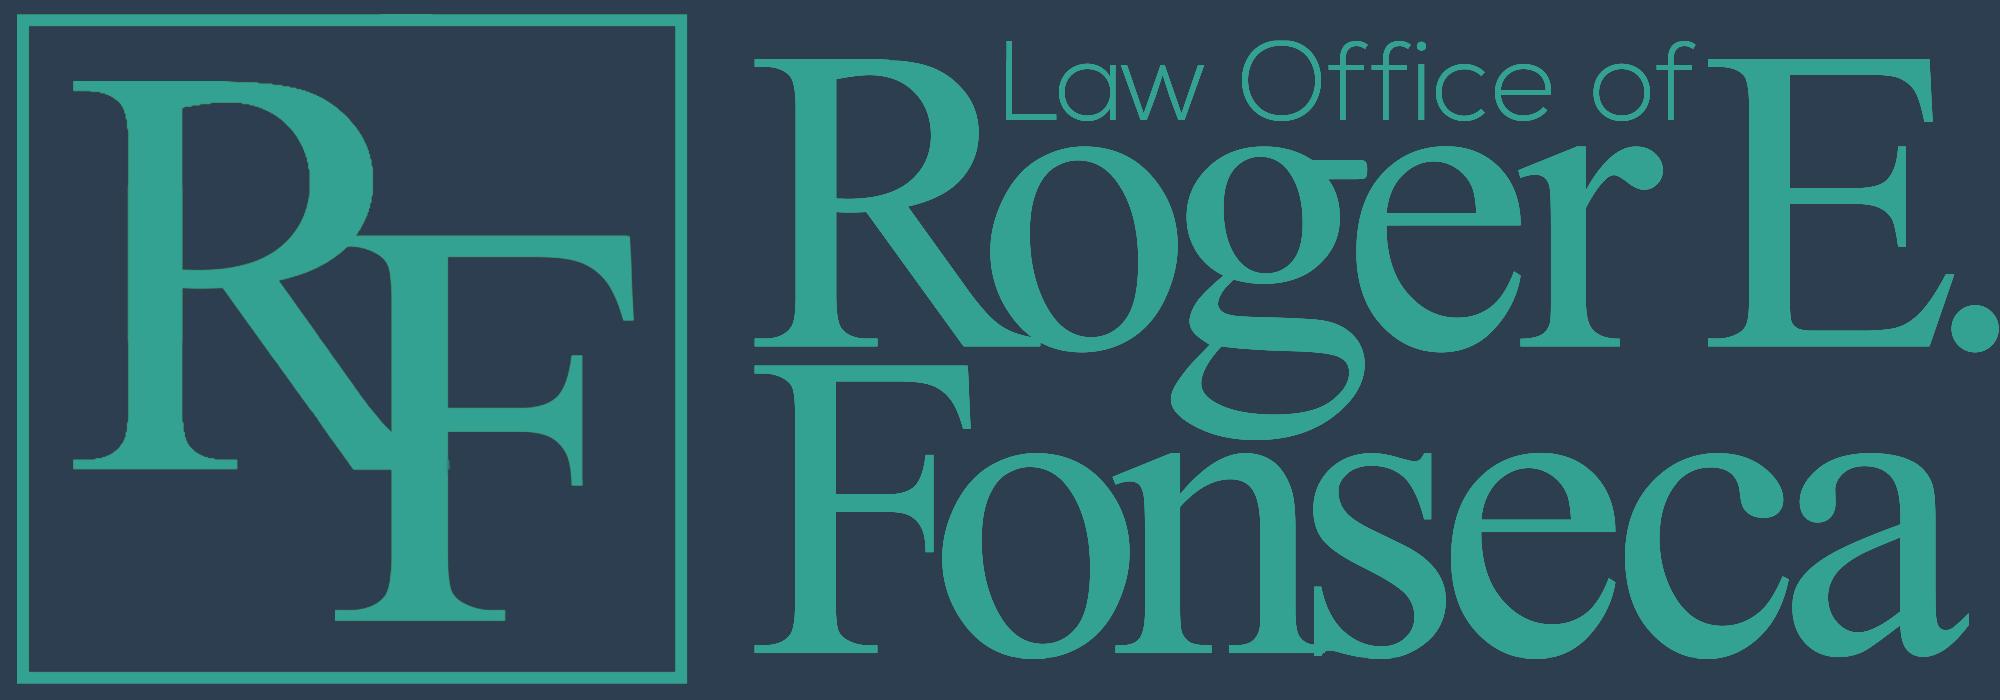 Law Office of Roger E. Fonseca